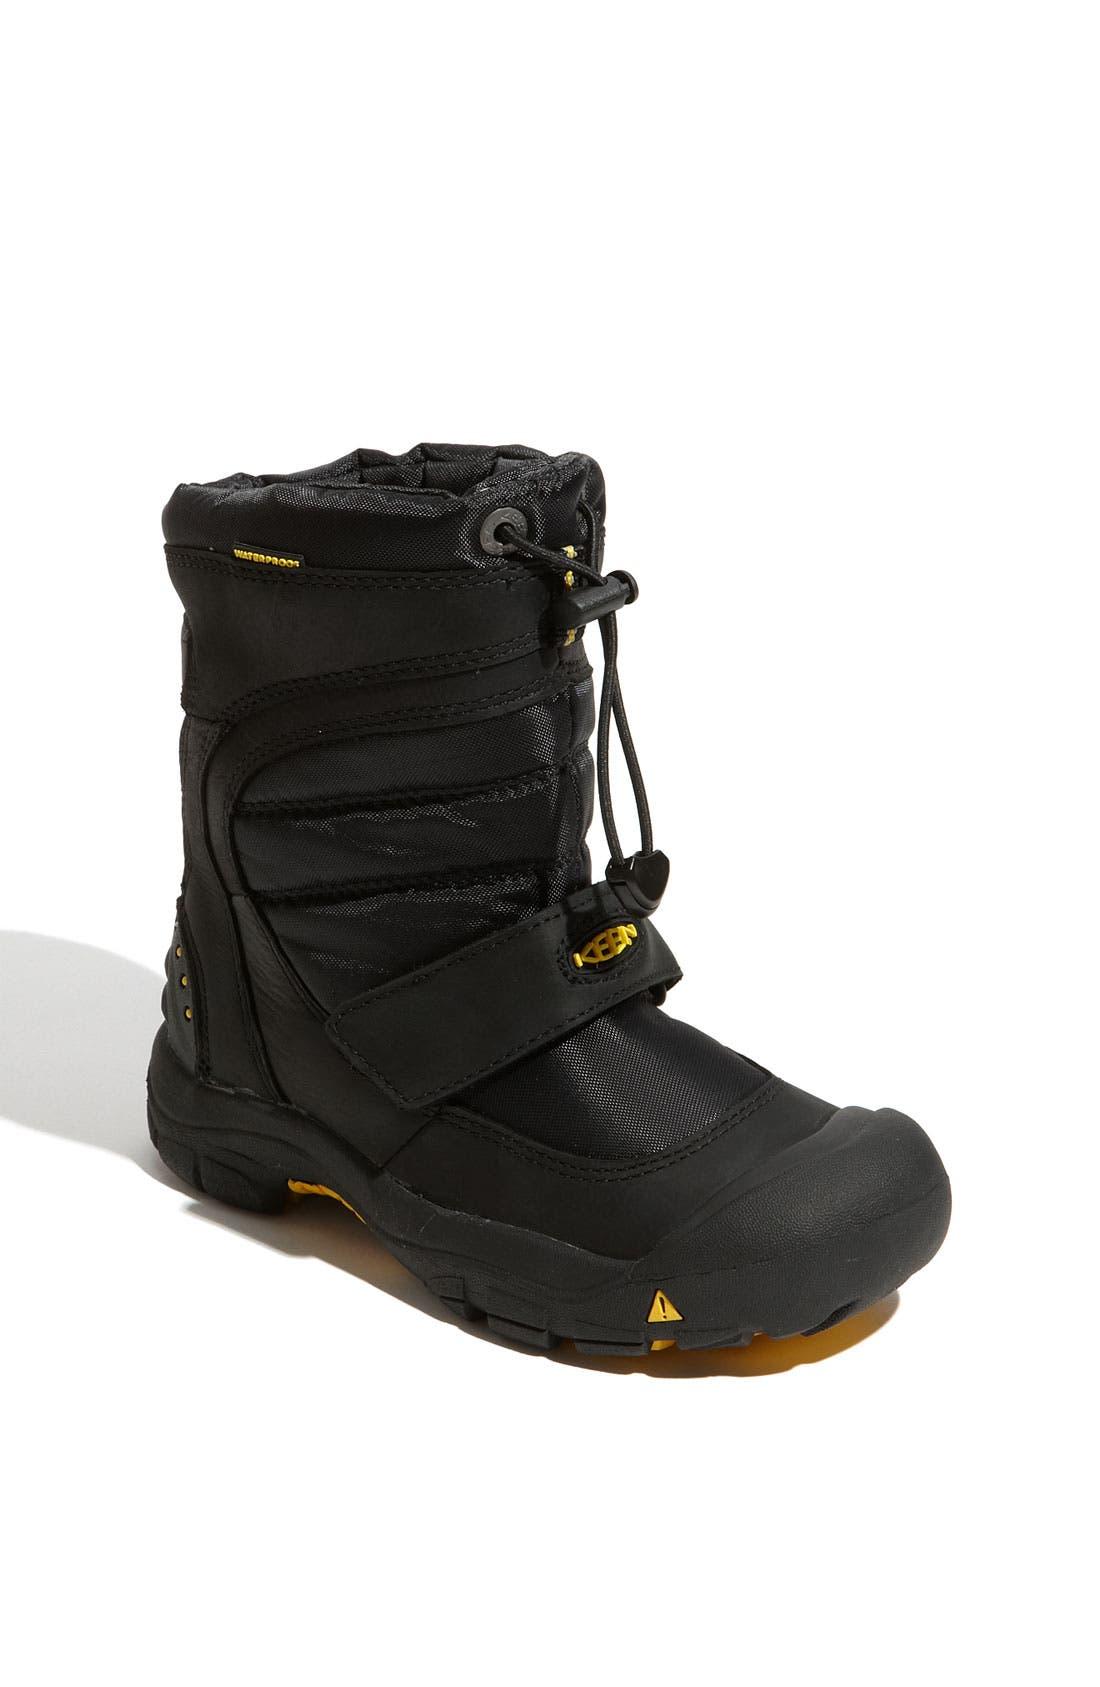 Main Image - Keen 'Breckenridge' Waterproof Boot (Toddler, Little Kid & Big Kid)